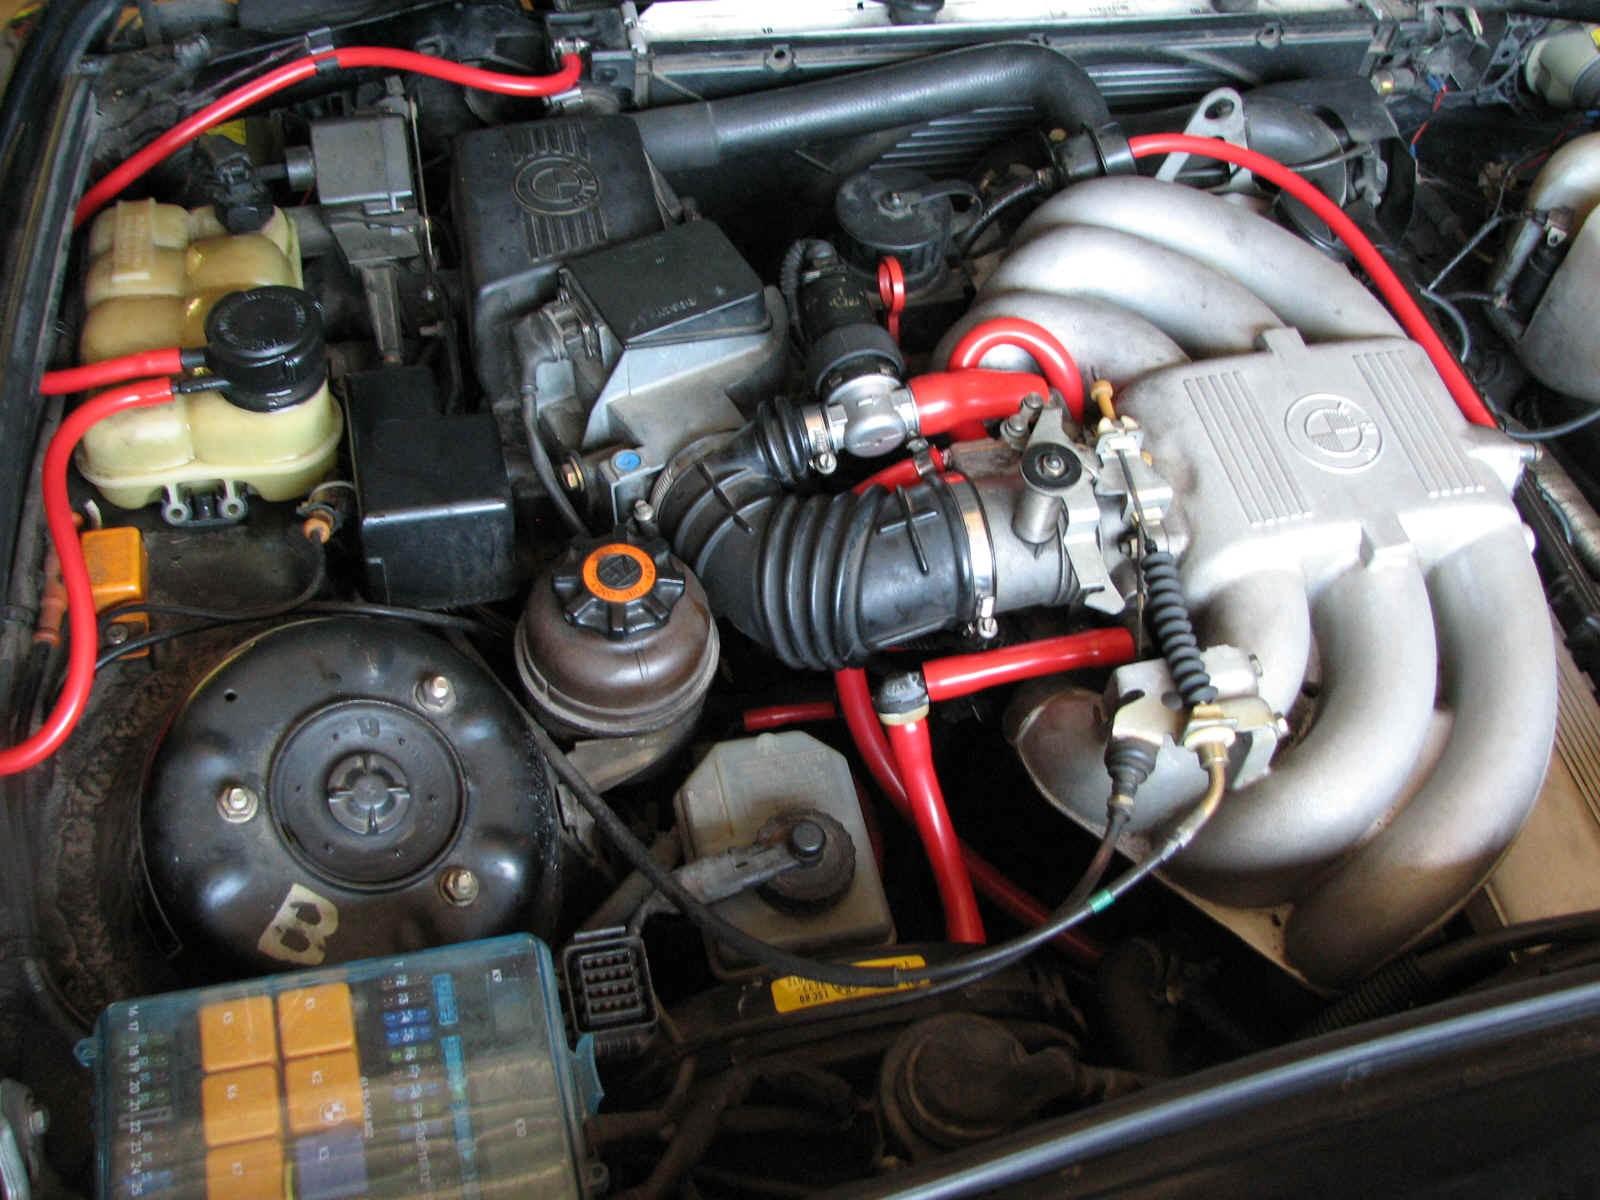 Bmw 318ti Engine Diagram Bmw E36 Engine Diagram Idle Control Valve 1988 Bmw 3 Series Of Bmw 318ti Engine Diagram